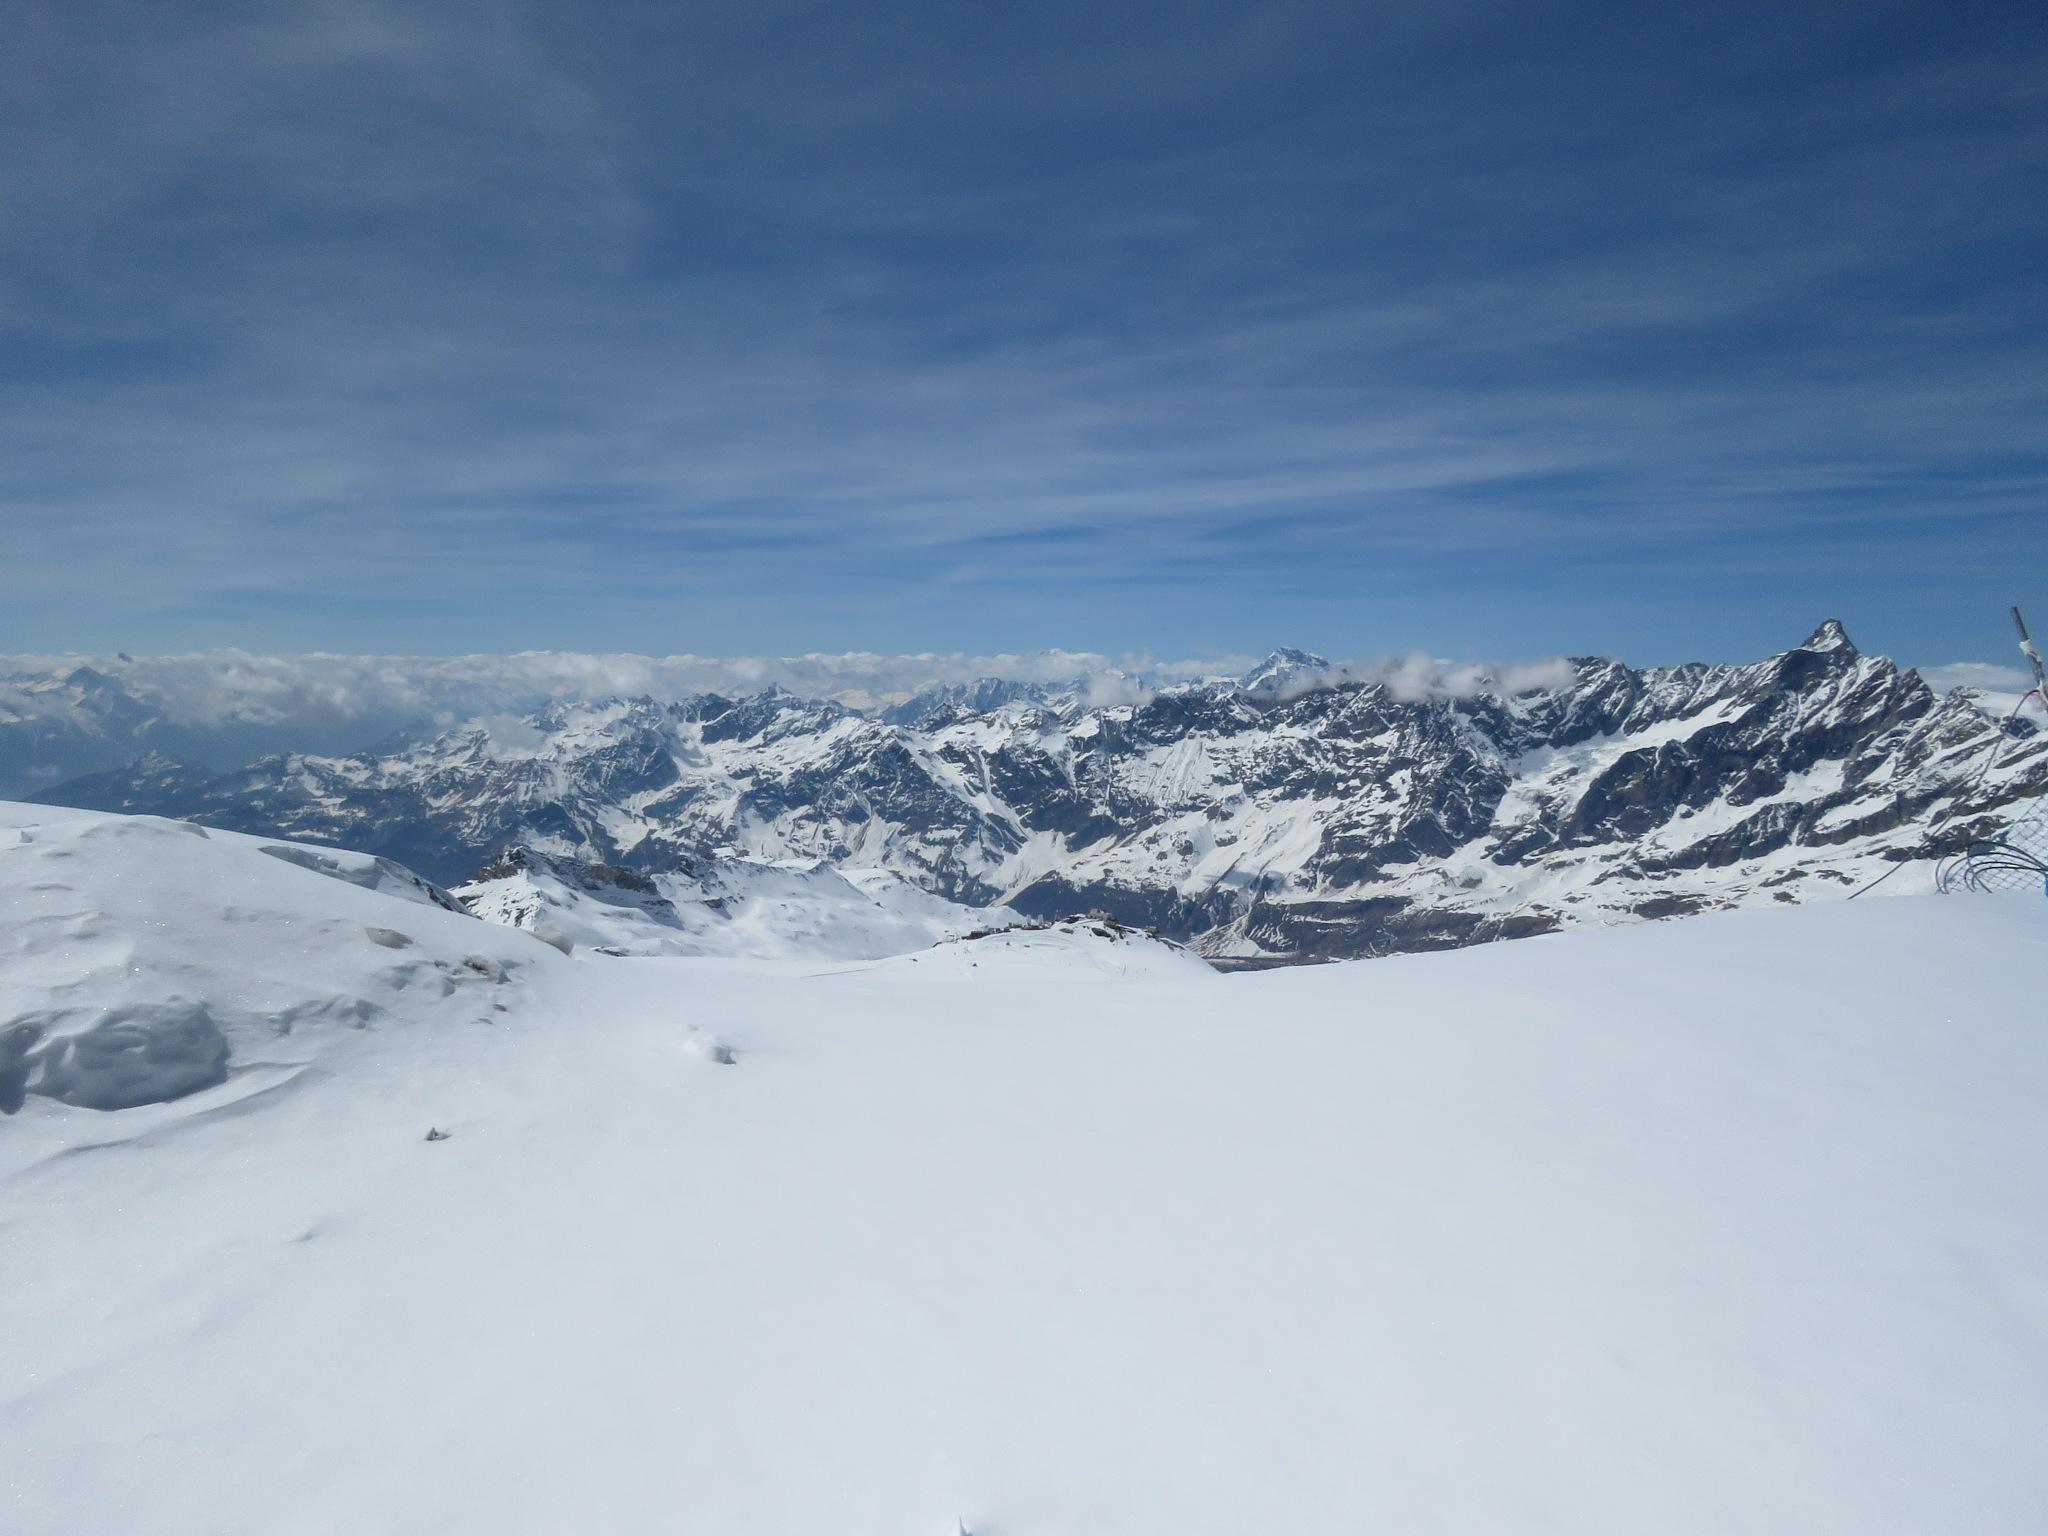 Zermatt, Switzerland by Bahrin Yusof